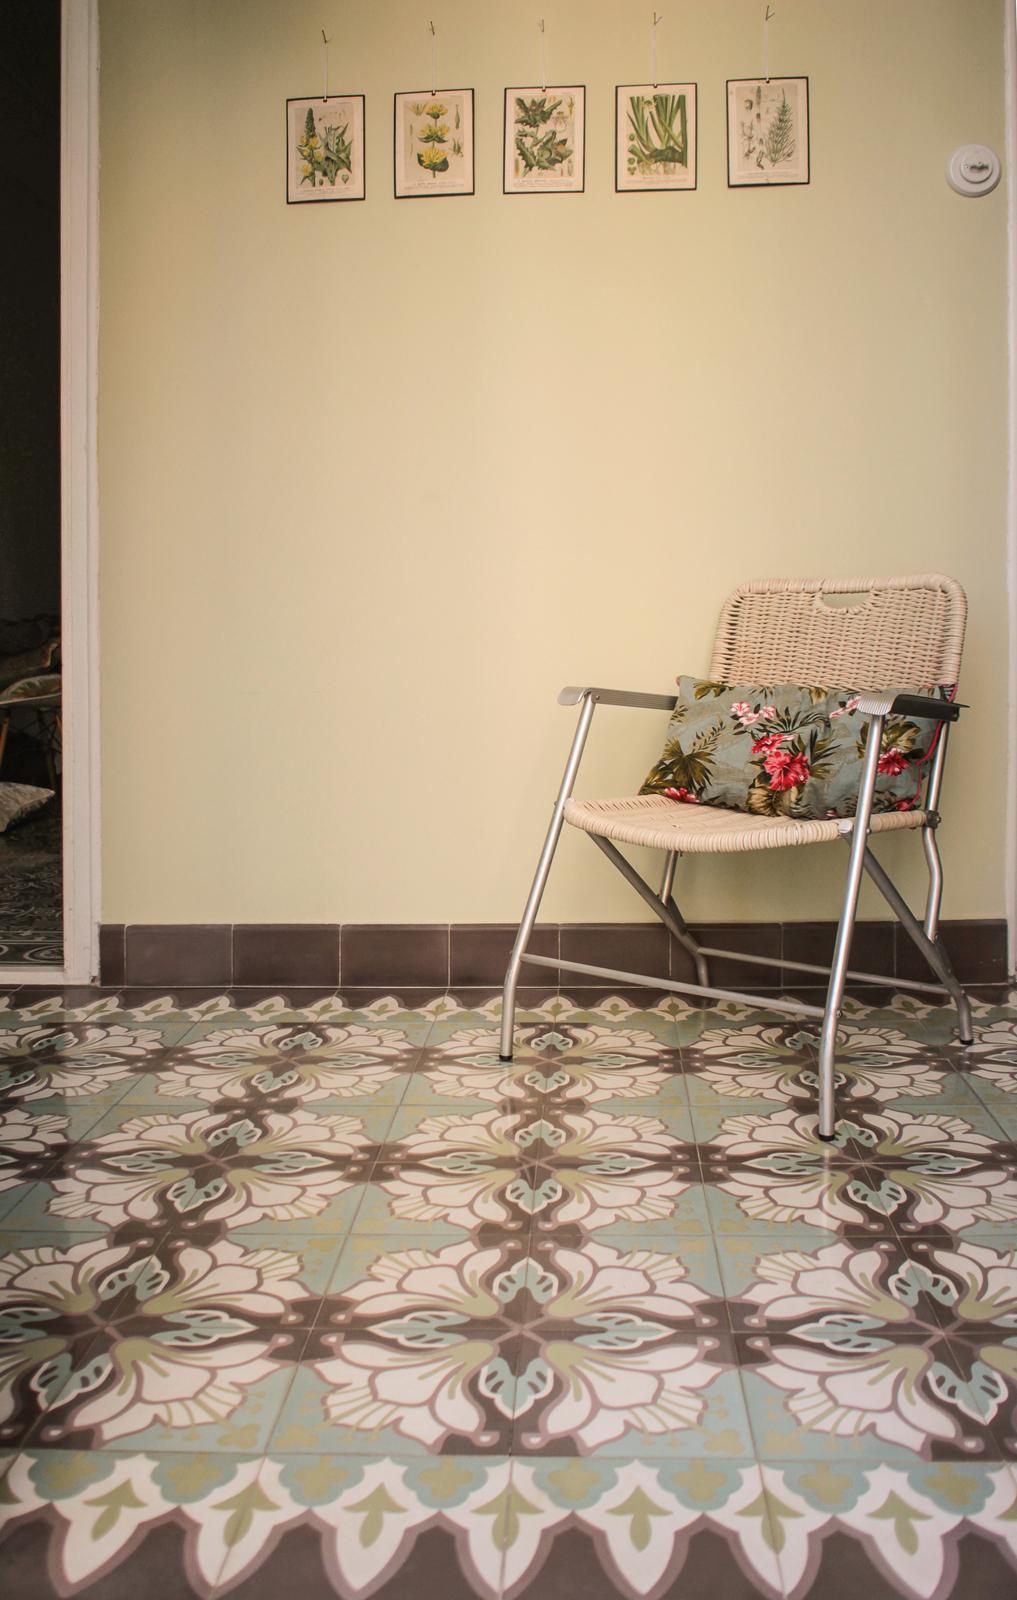 VIA Zementmosaikplatten-nr.51138-wintergarten-02-viaplatten | 51138